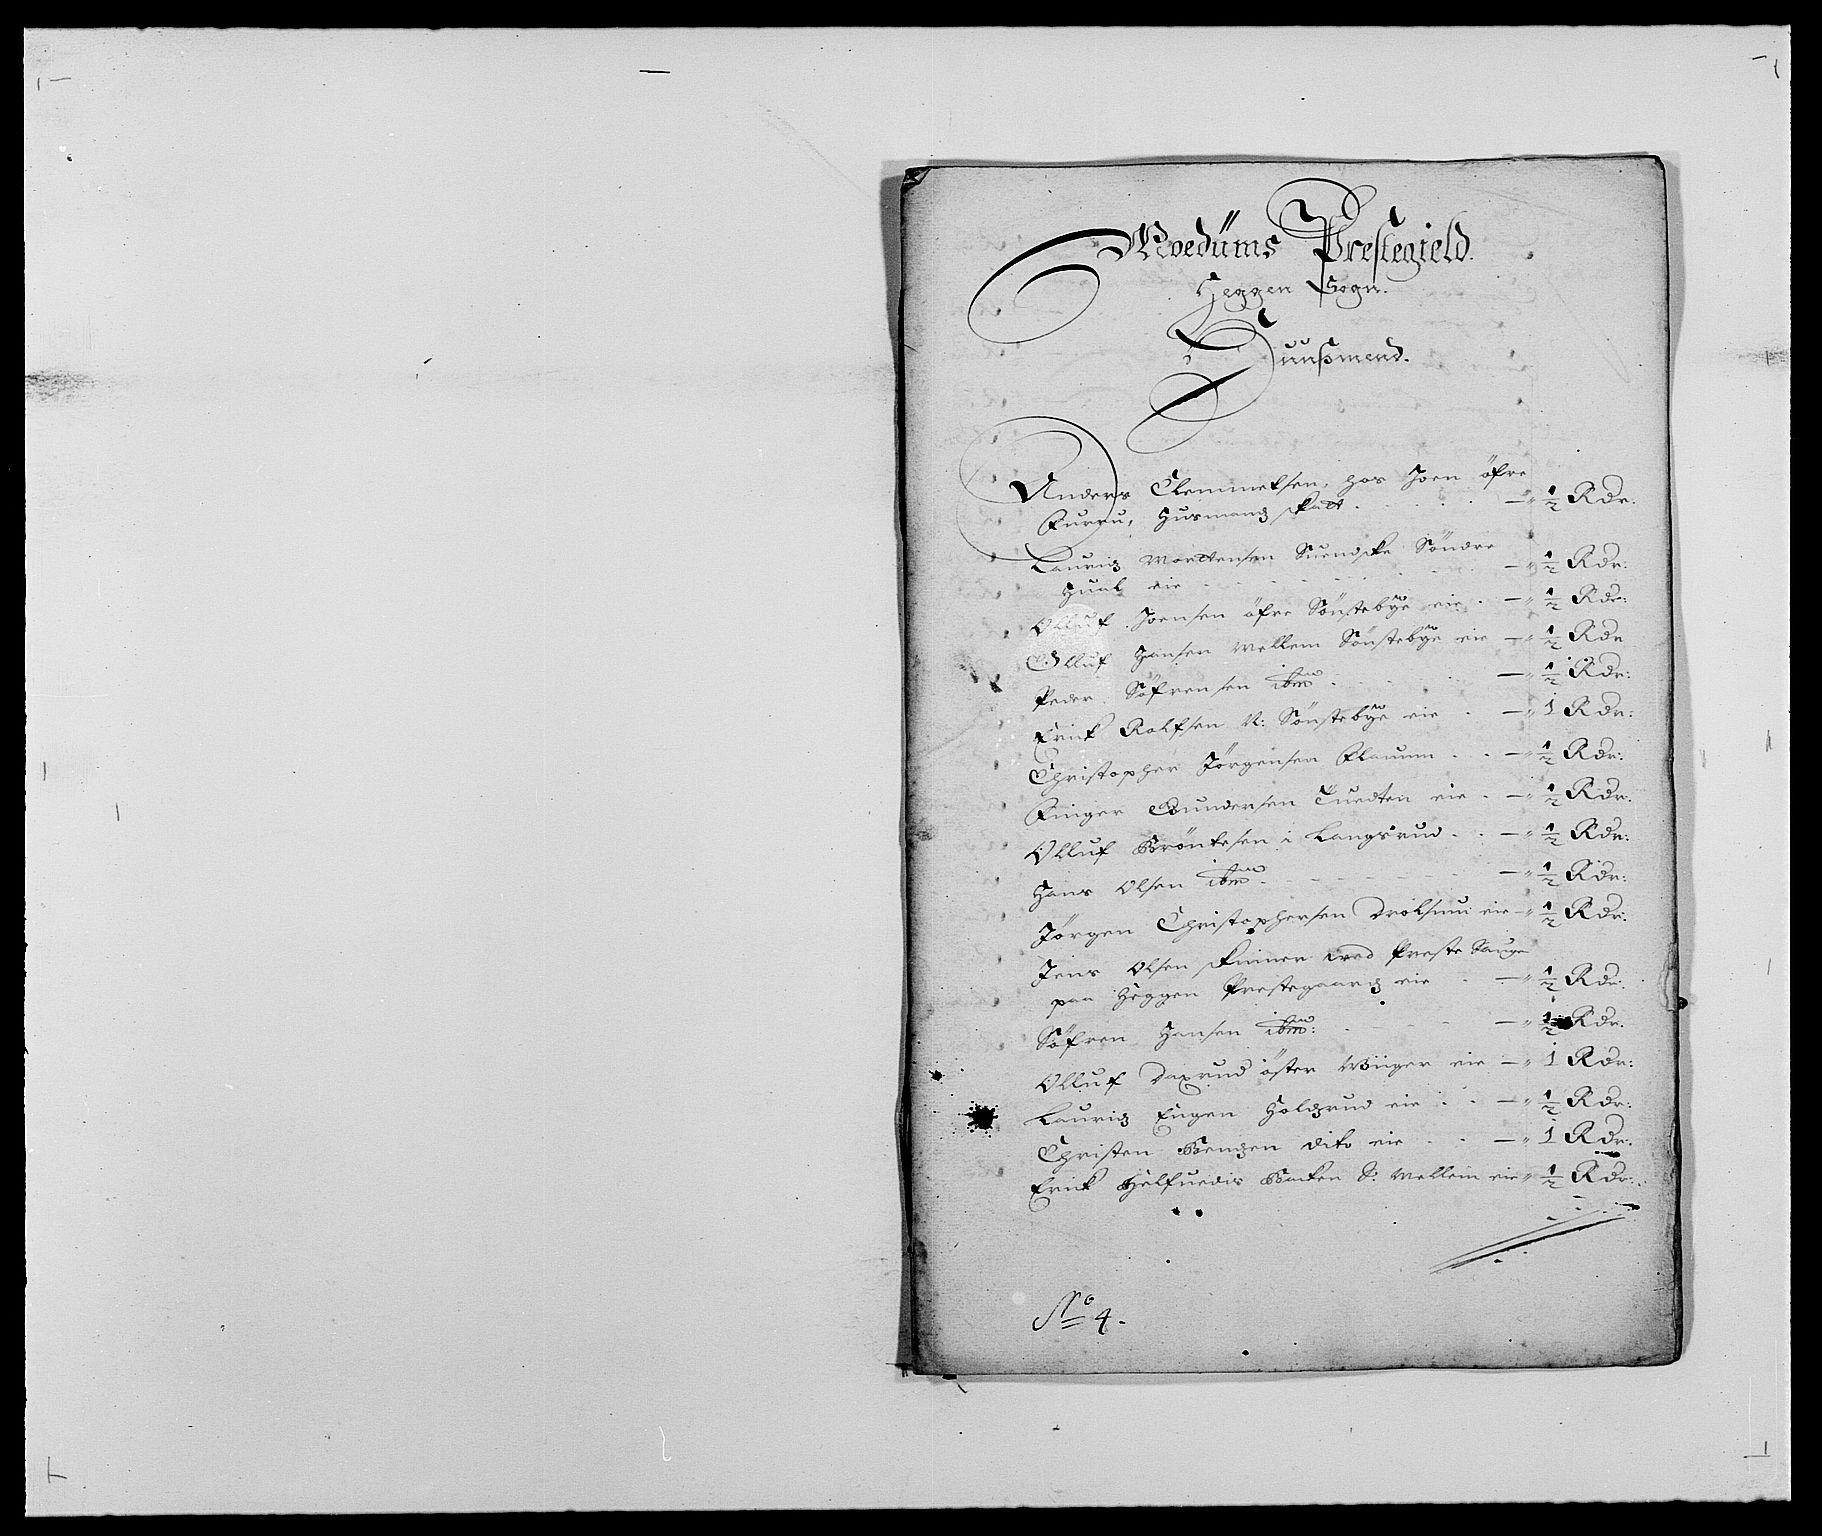 RA, Rentekammeret inntil 1814, Reviderte regnskaper, Fogderegnskap, R25/L1679: Fogderegnskap Buskerud, 1687-1688, s. 412